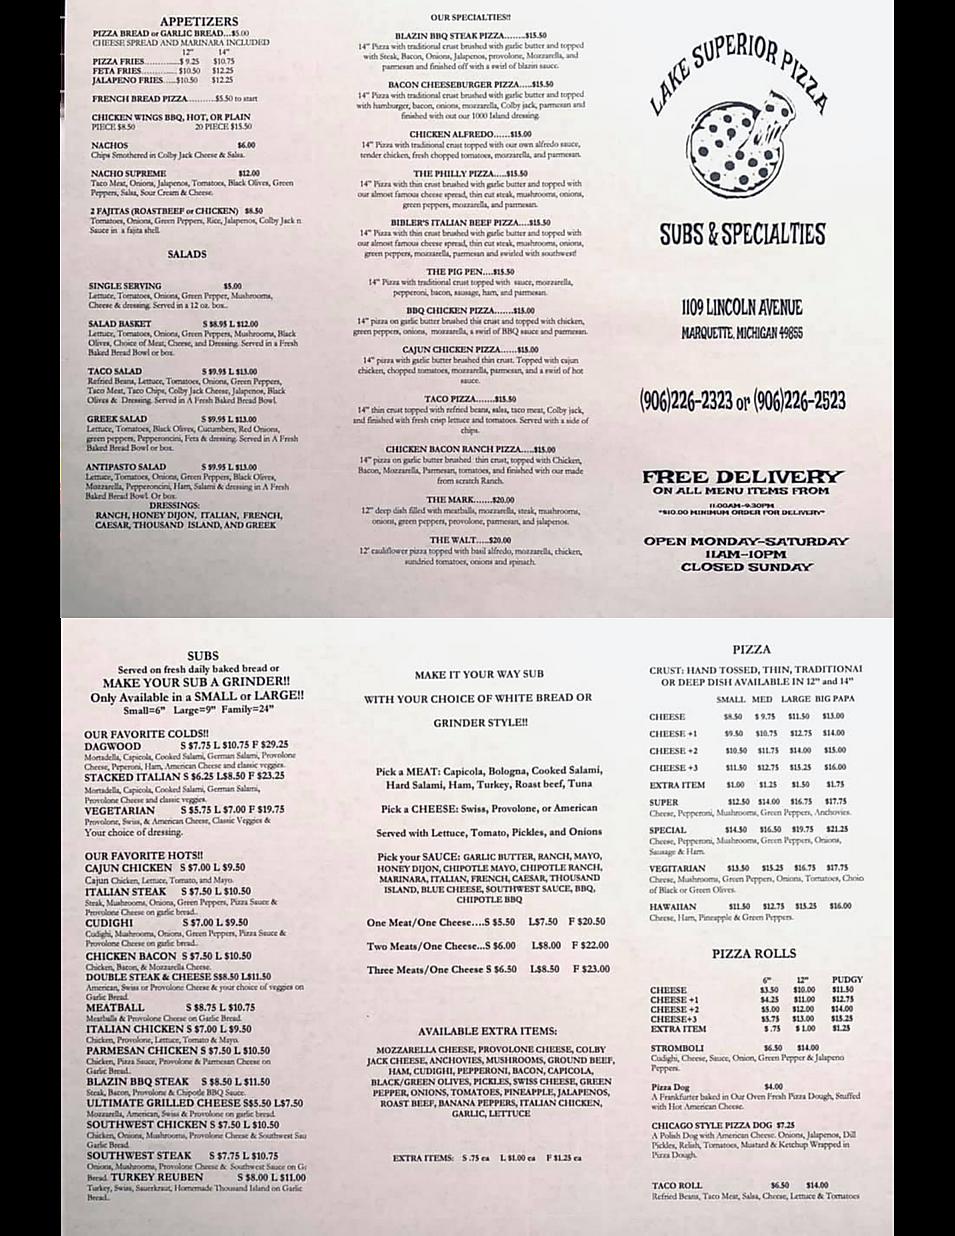 Lake Superior pizza subs specialties restaurant menu  hours location deals Marquette Now